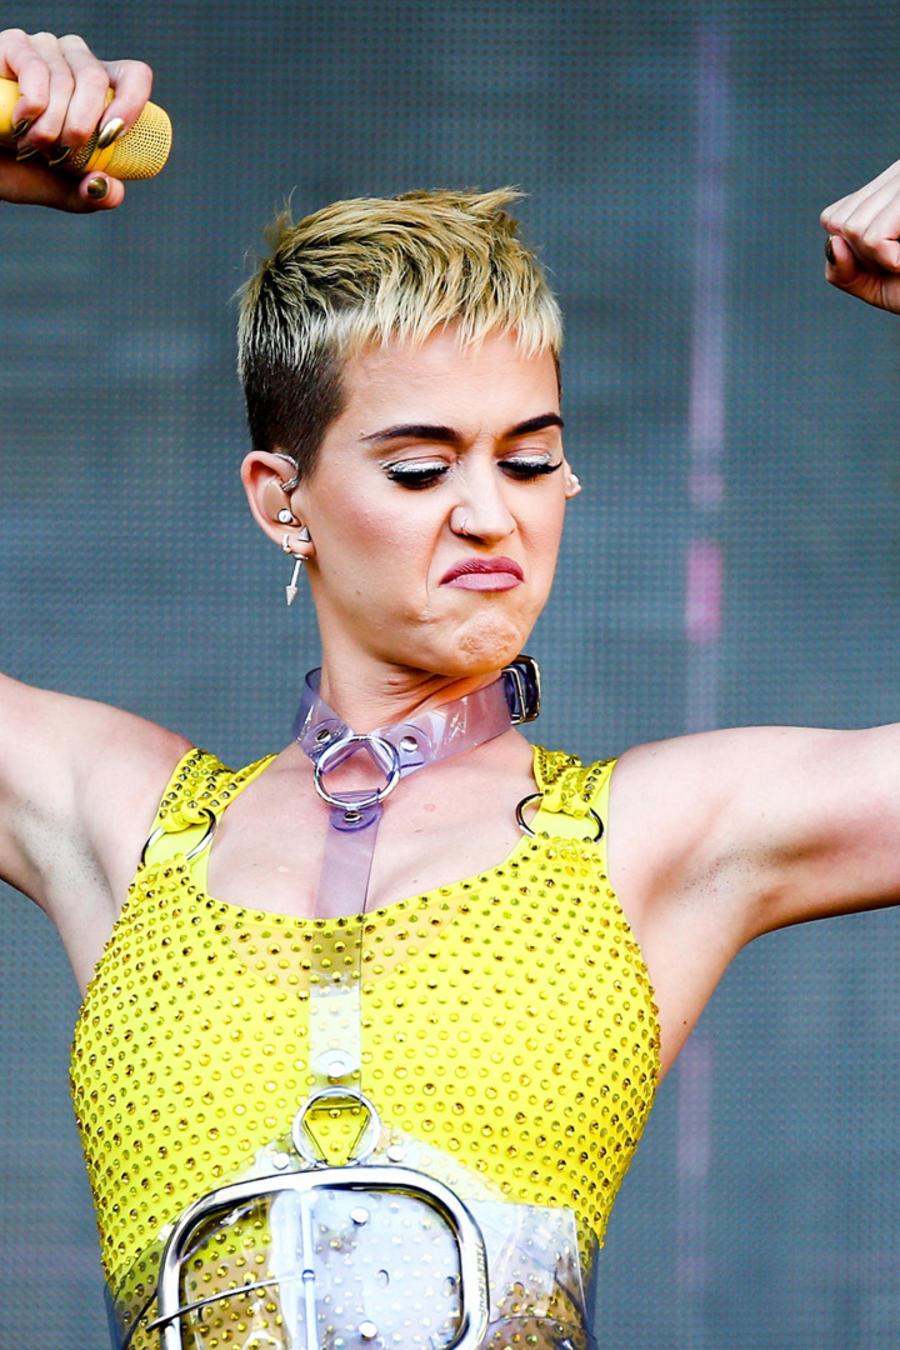 Katy Perry en 2017 Wango Tango - Show